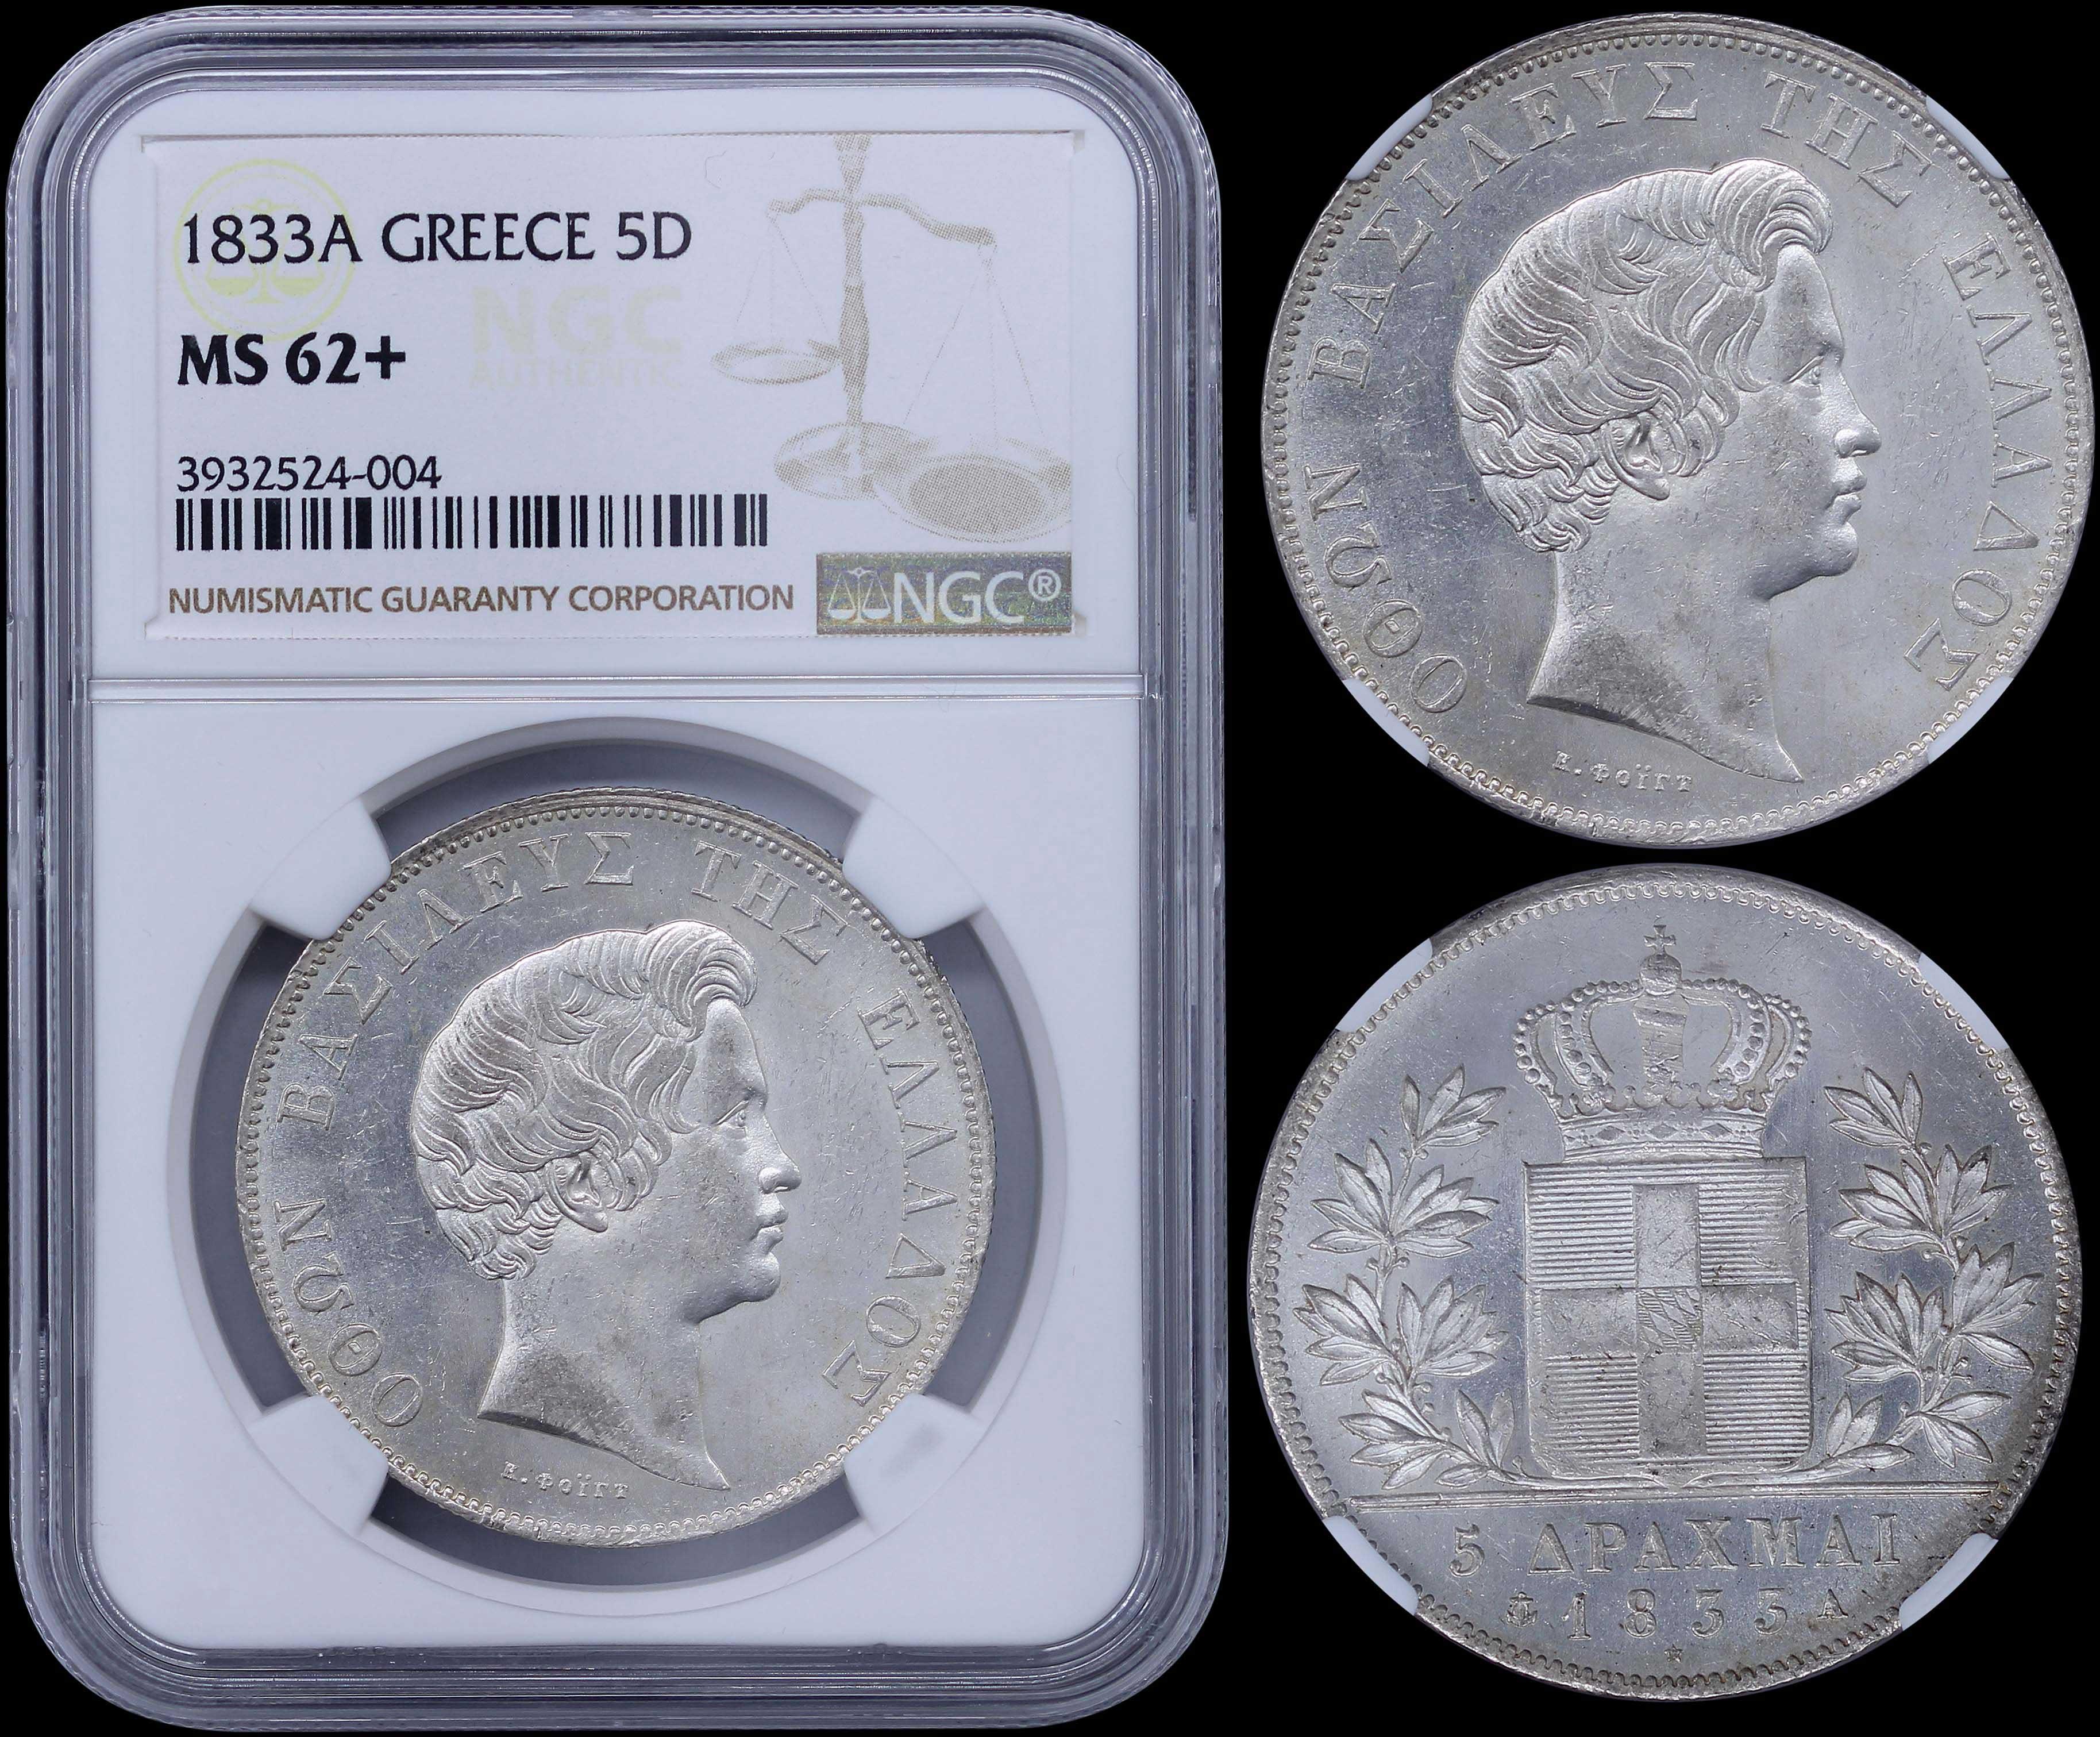 Lot 8083 - -  COINS & TOKENS king otto -  A. Karamitsos Public & Live Bid Auction 644 Coins, Medals & Banknotes